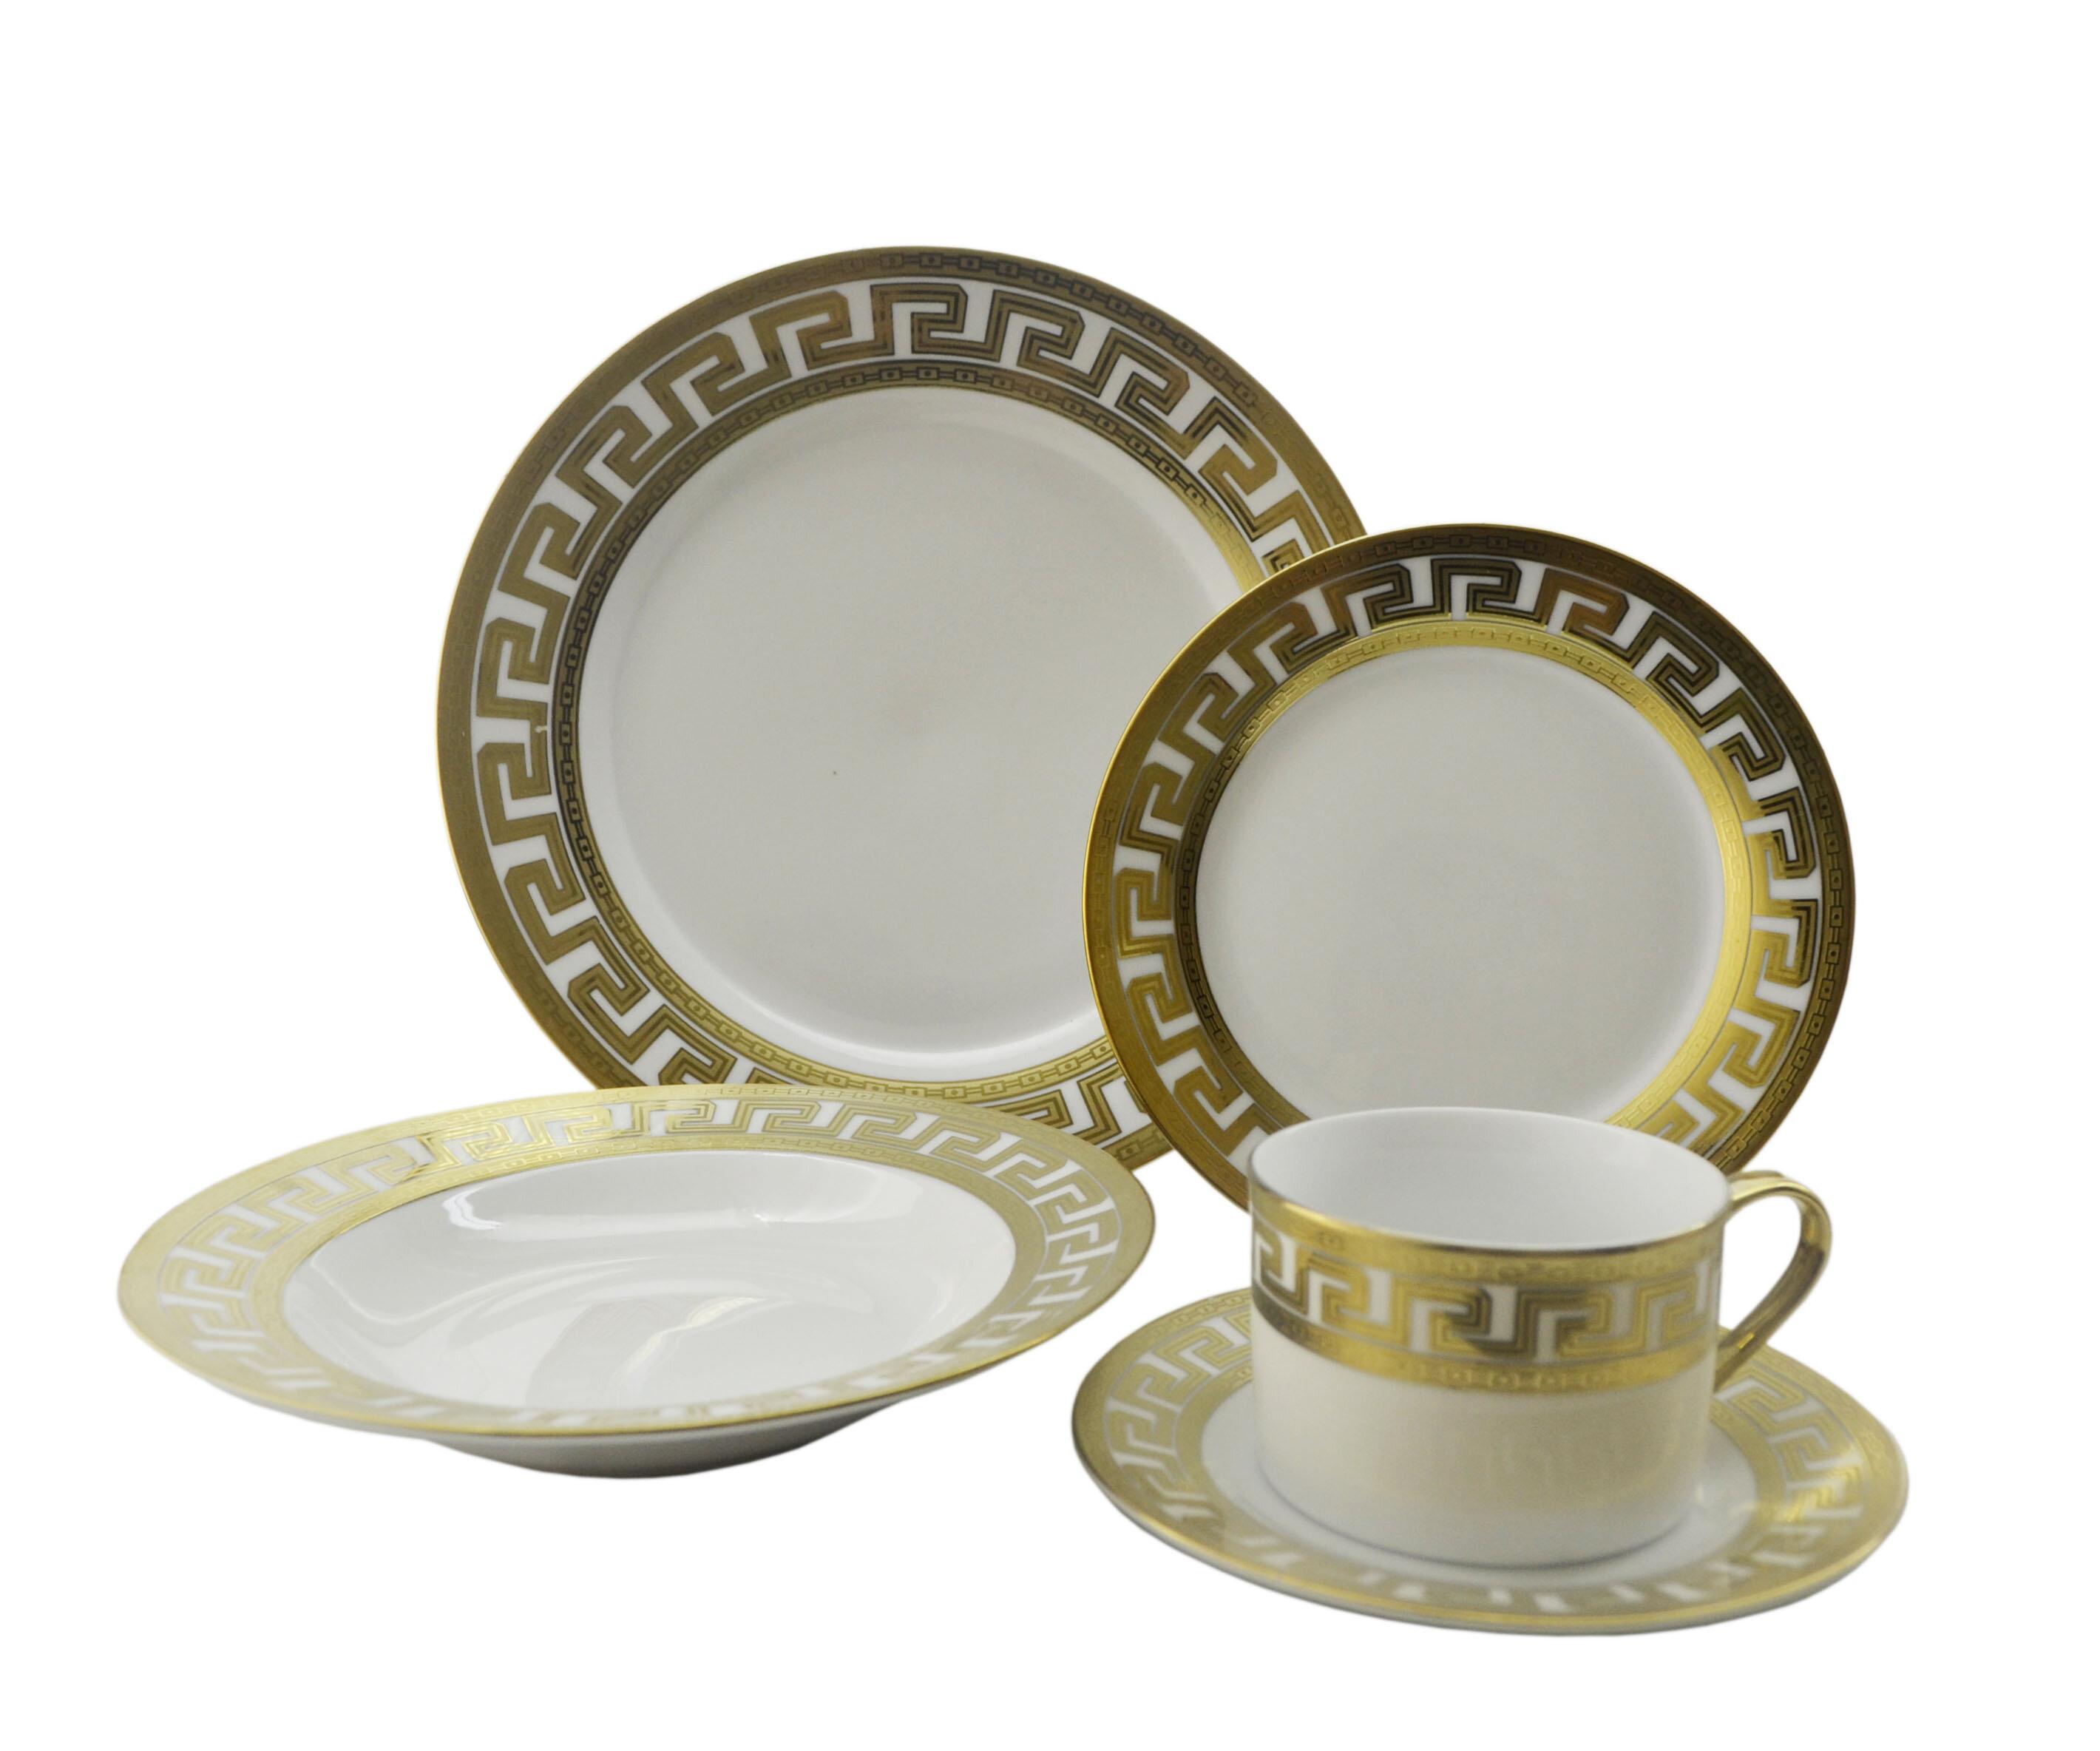 Three Star Inspired Versace 40 Piece Dinnerware Set Service for 8 u0026 Reviews | Wayfair  sc 1 st  Wayfair & Three Star Inspired Versace 40 Piece Dinnerware Set Service for 8 ...